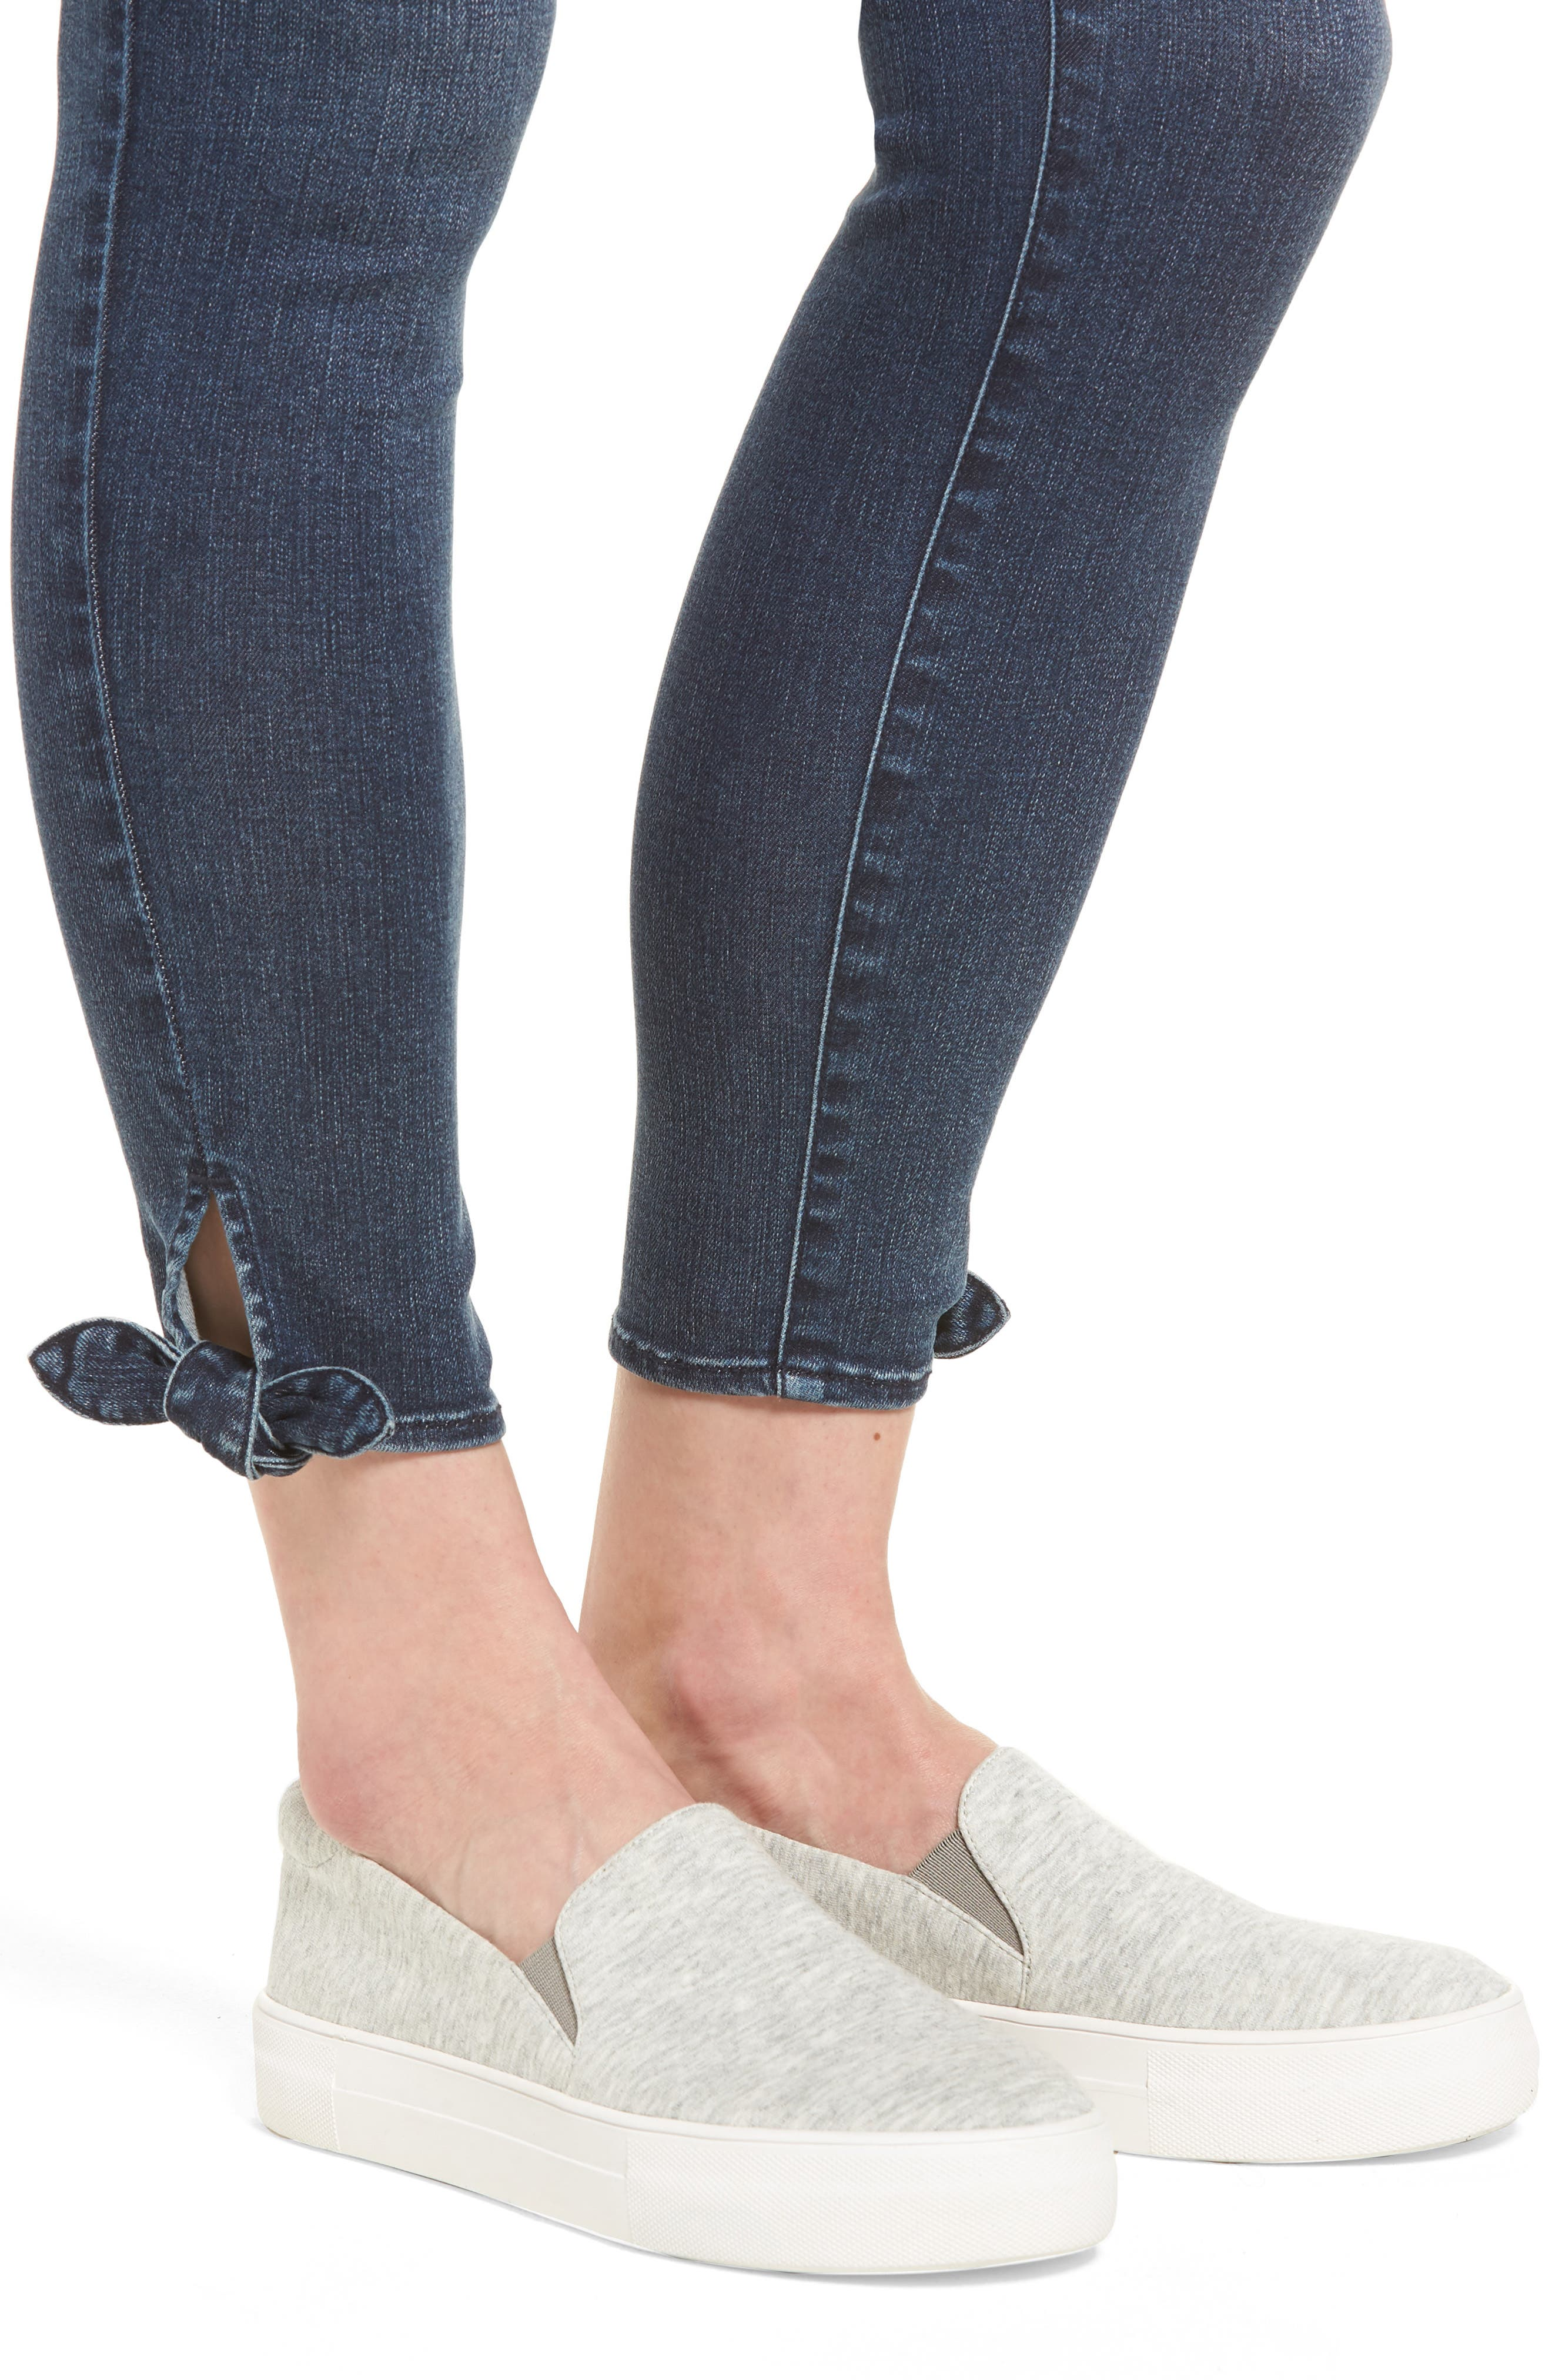 Ab-solution Ankle Skinny Skimmer Jeans,                             Alternate thumbnail 4, color,                             Bl- Blue